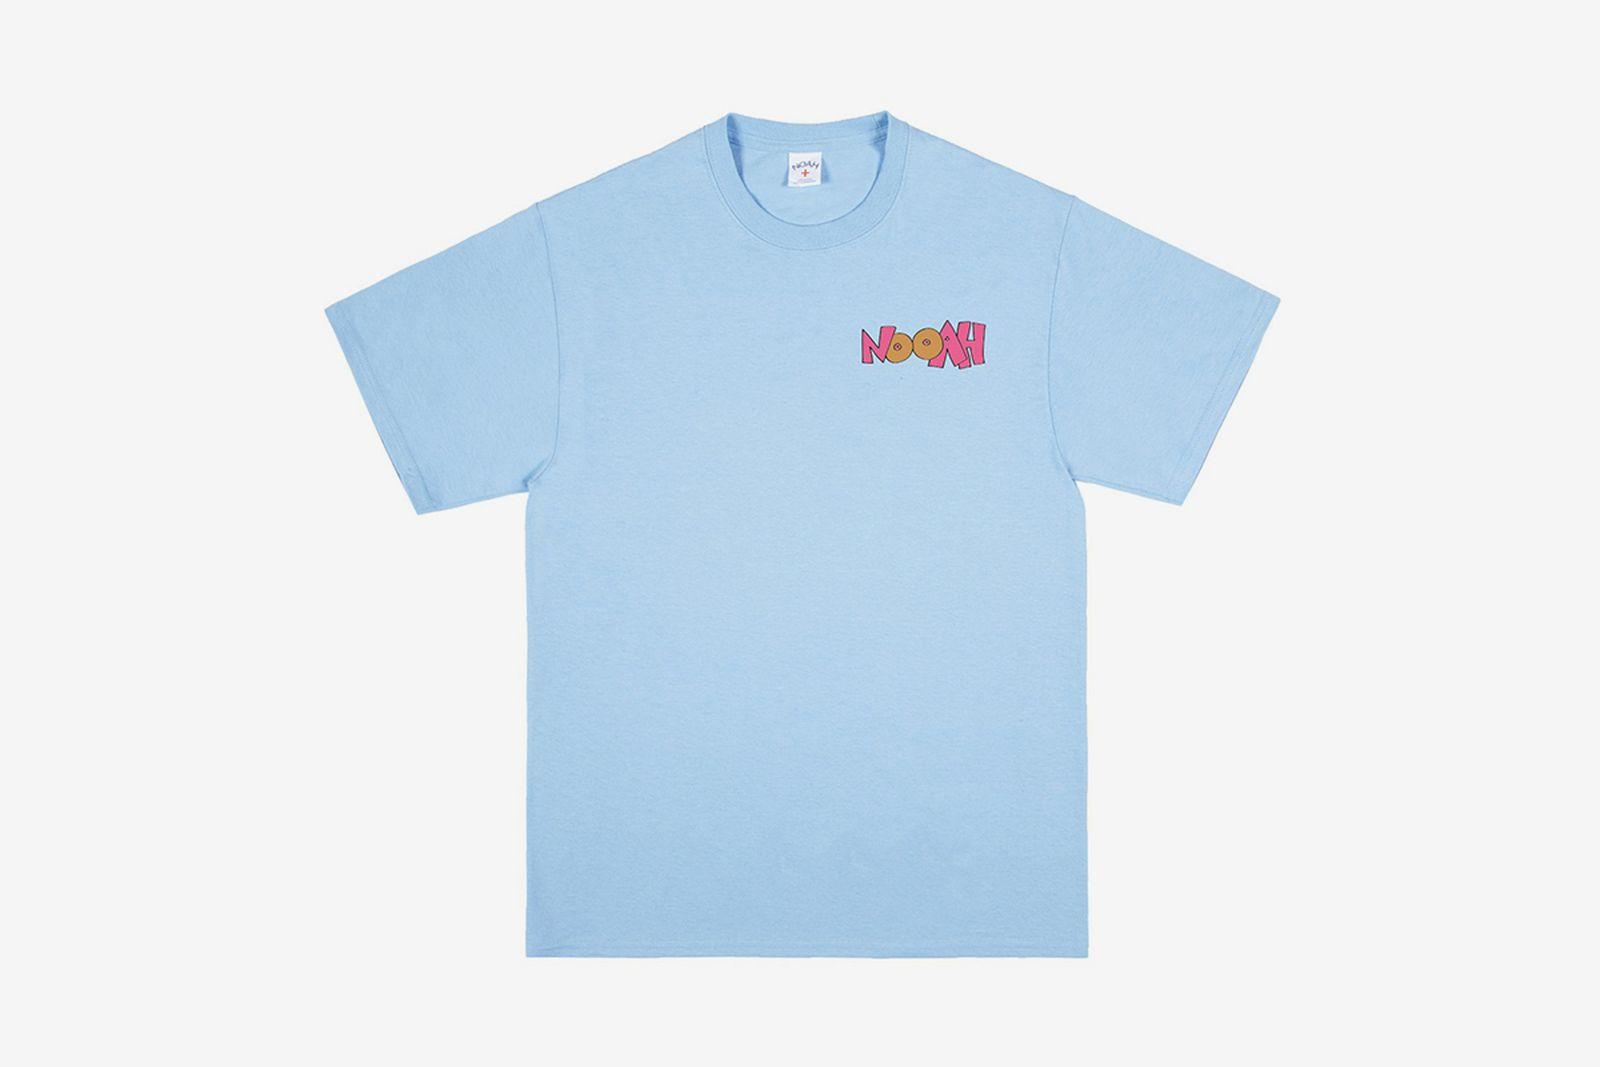 noah breast cancer awareness t shirts